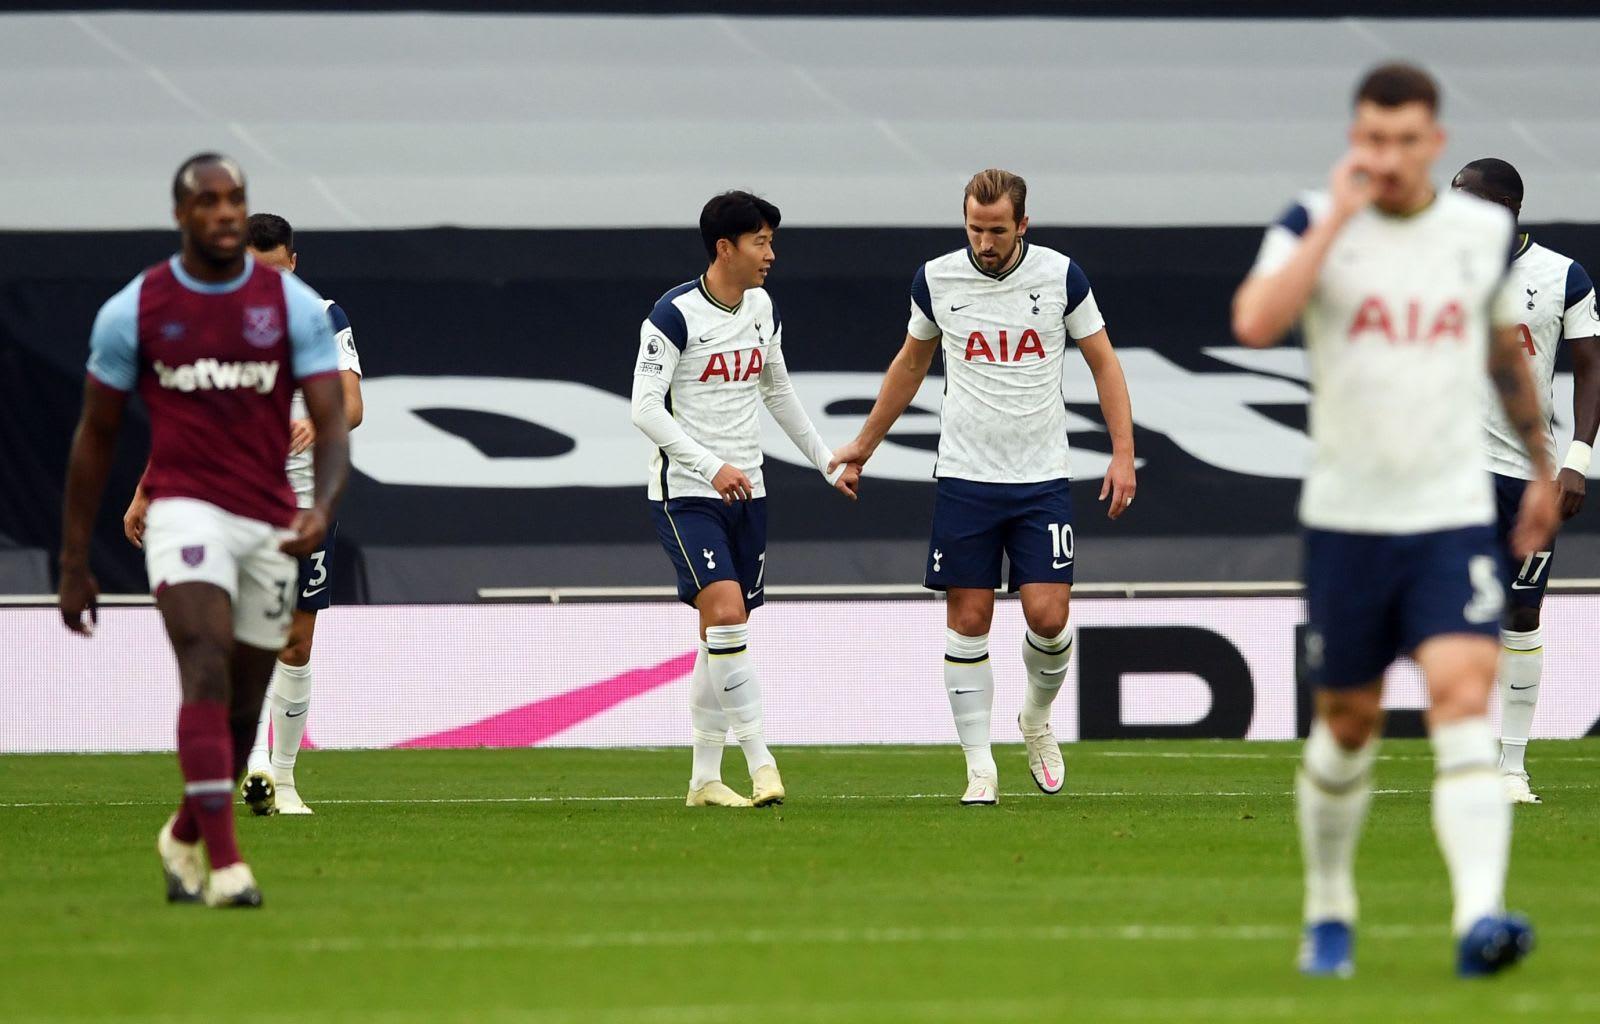 Tottenham Hotspur's strikers Harry Kane and Son Heung-Min